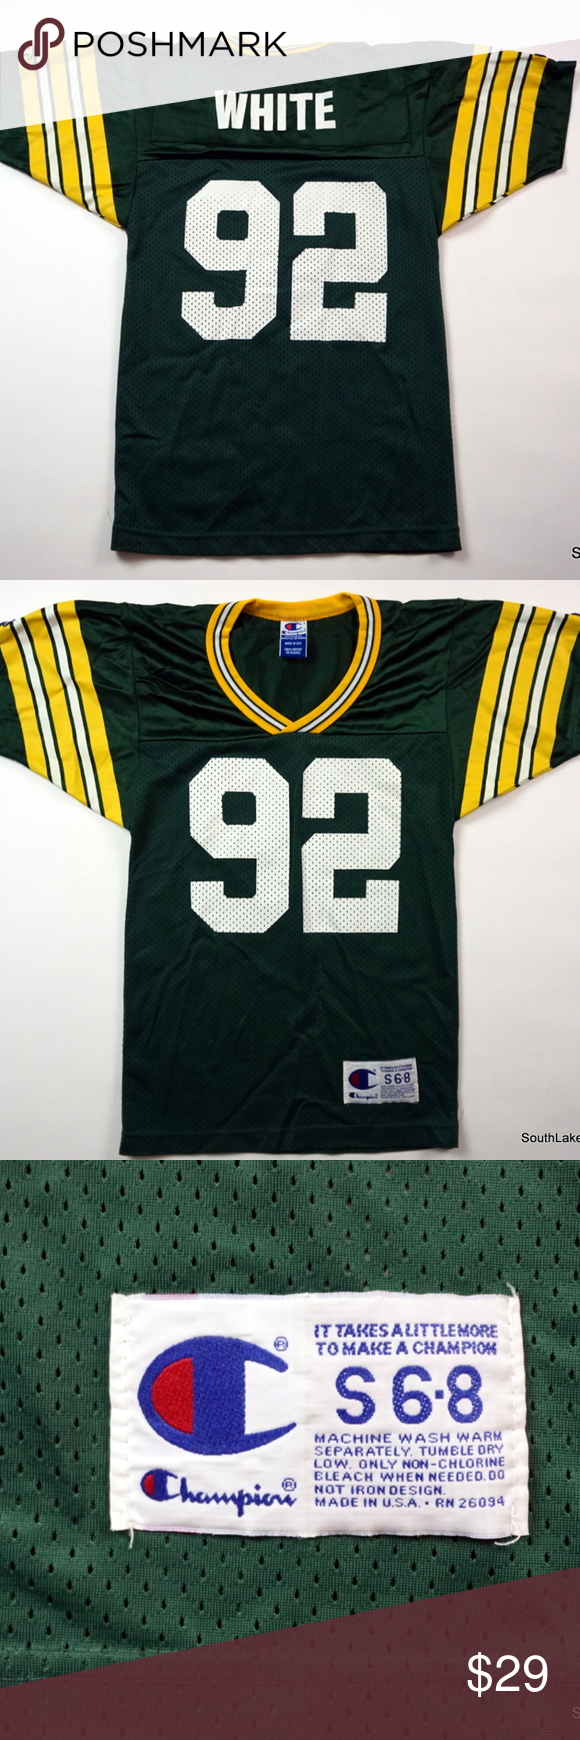 the best attitude aa42e 09ad2 VTG Green Bay Packers Reggie White Jersey #92 VTG Champion ...